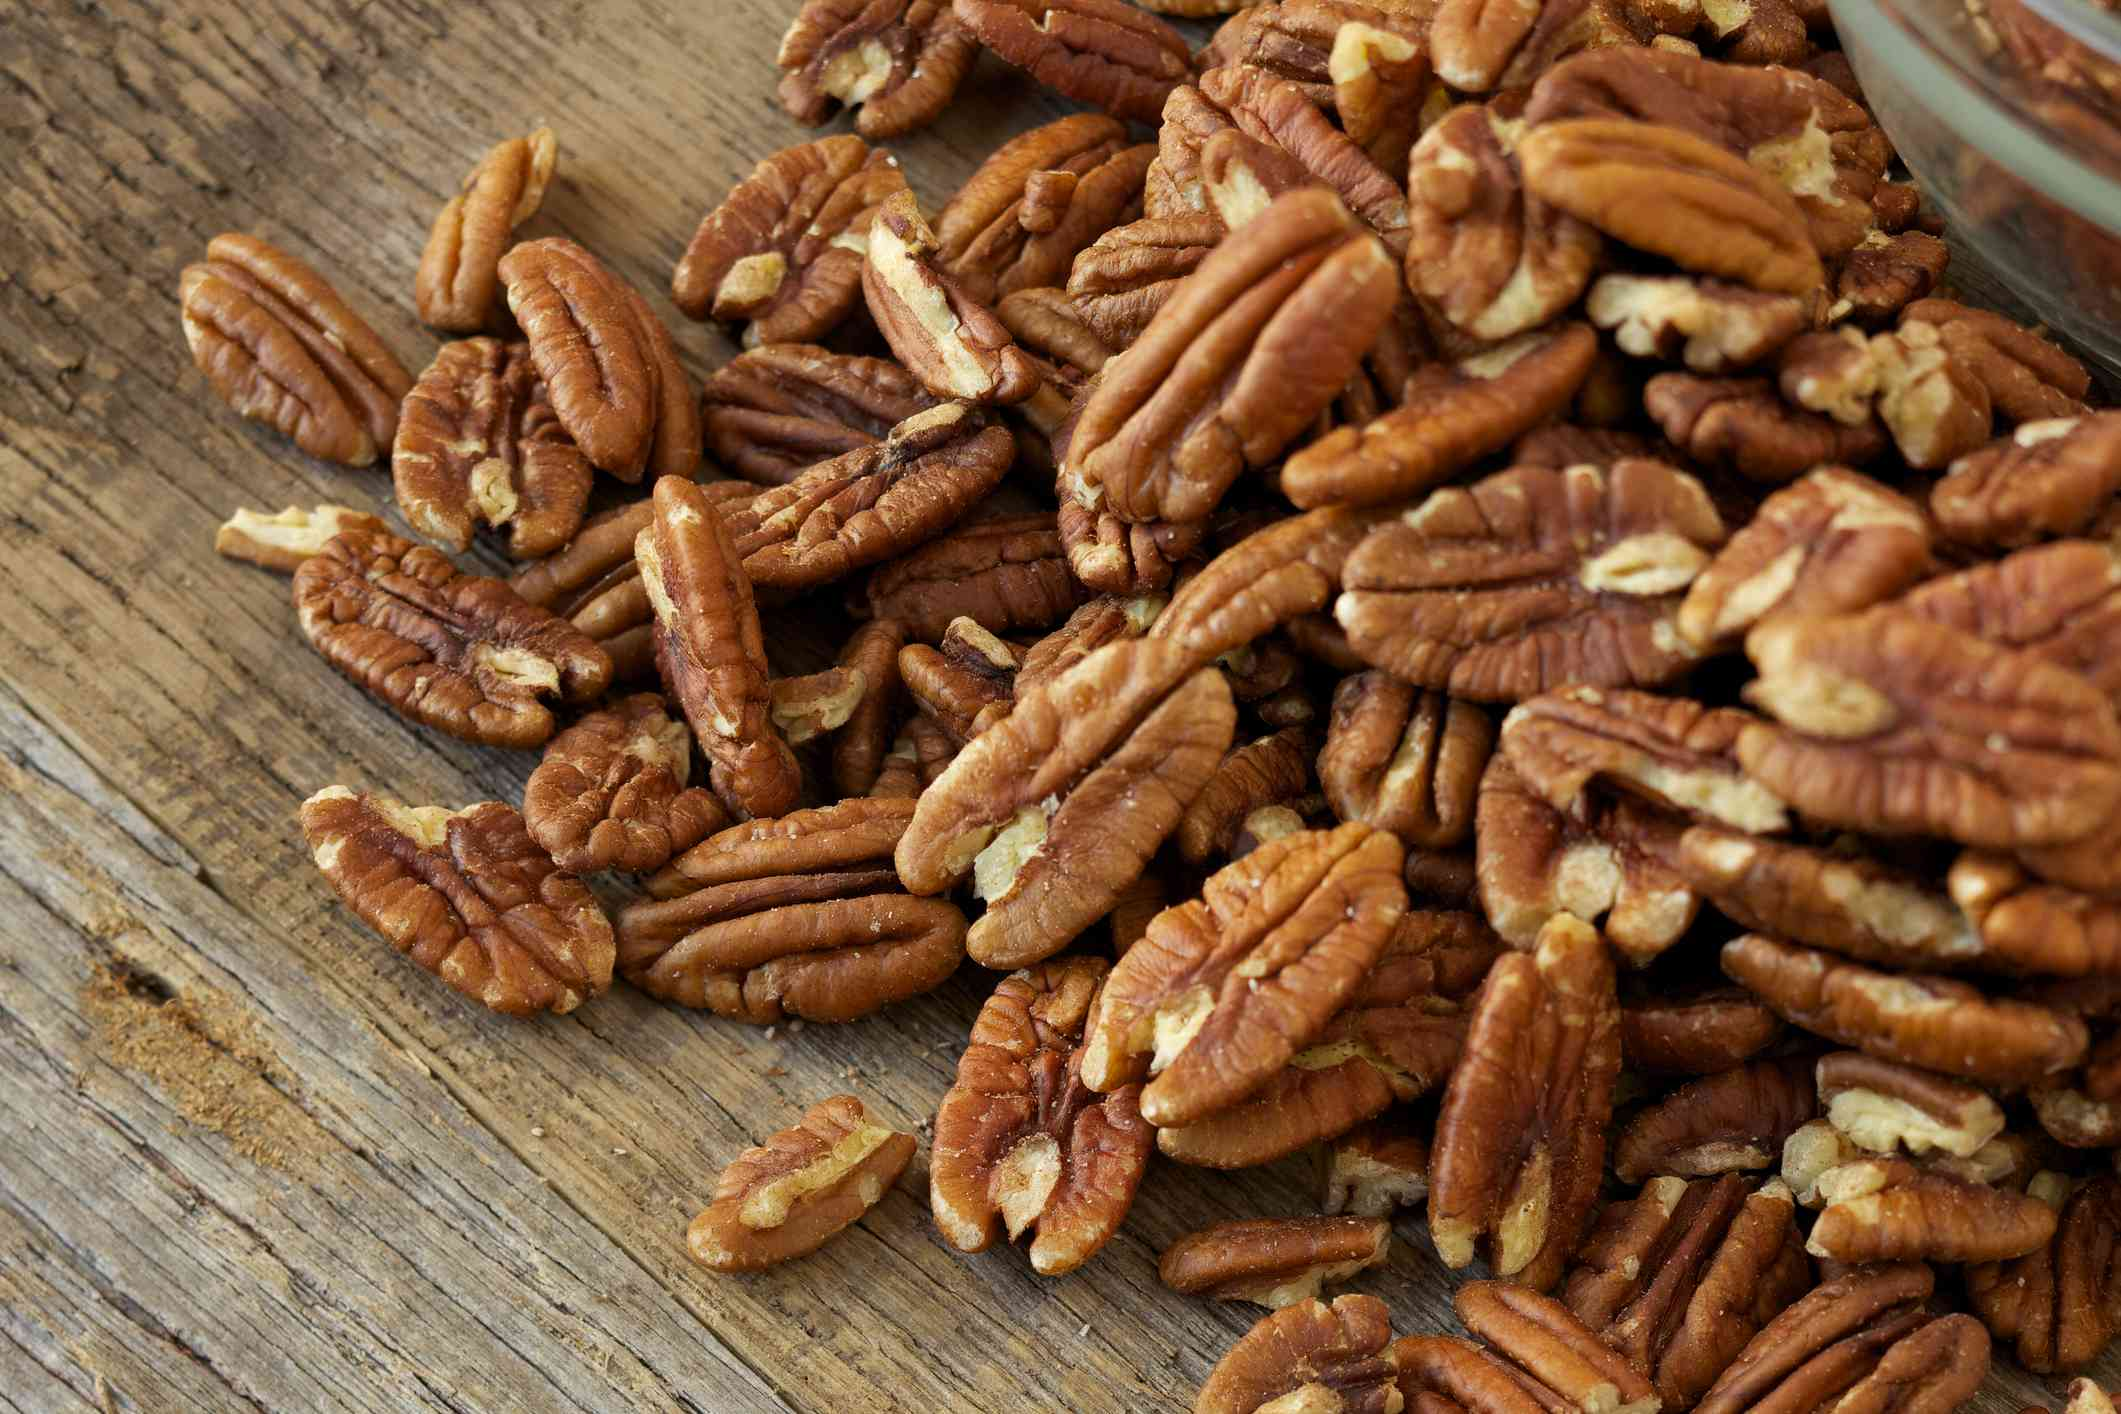 Pecan nuts on rustic wood table